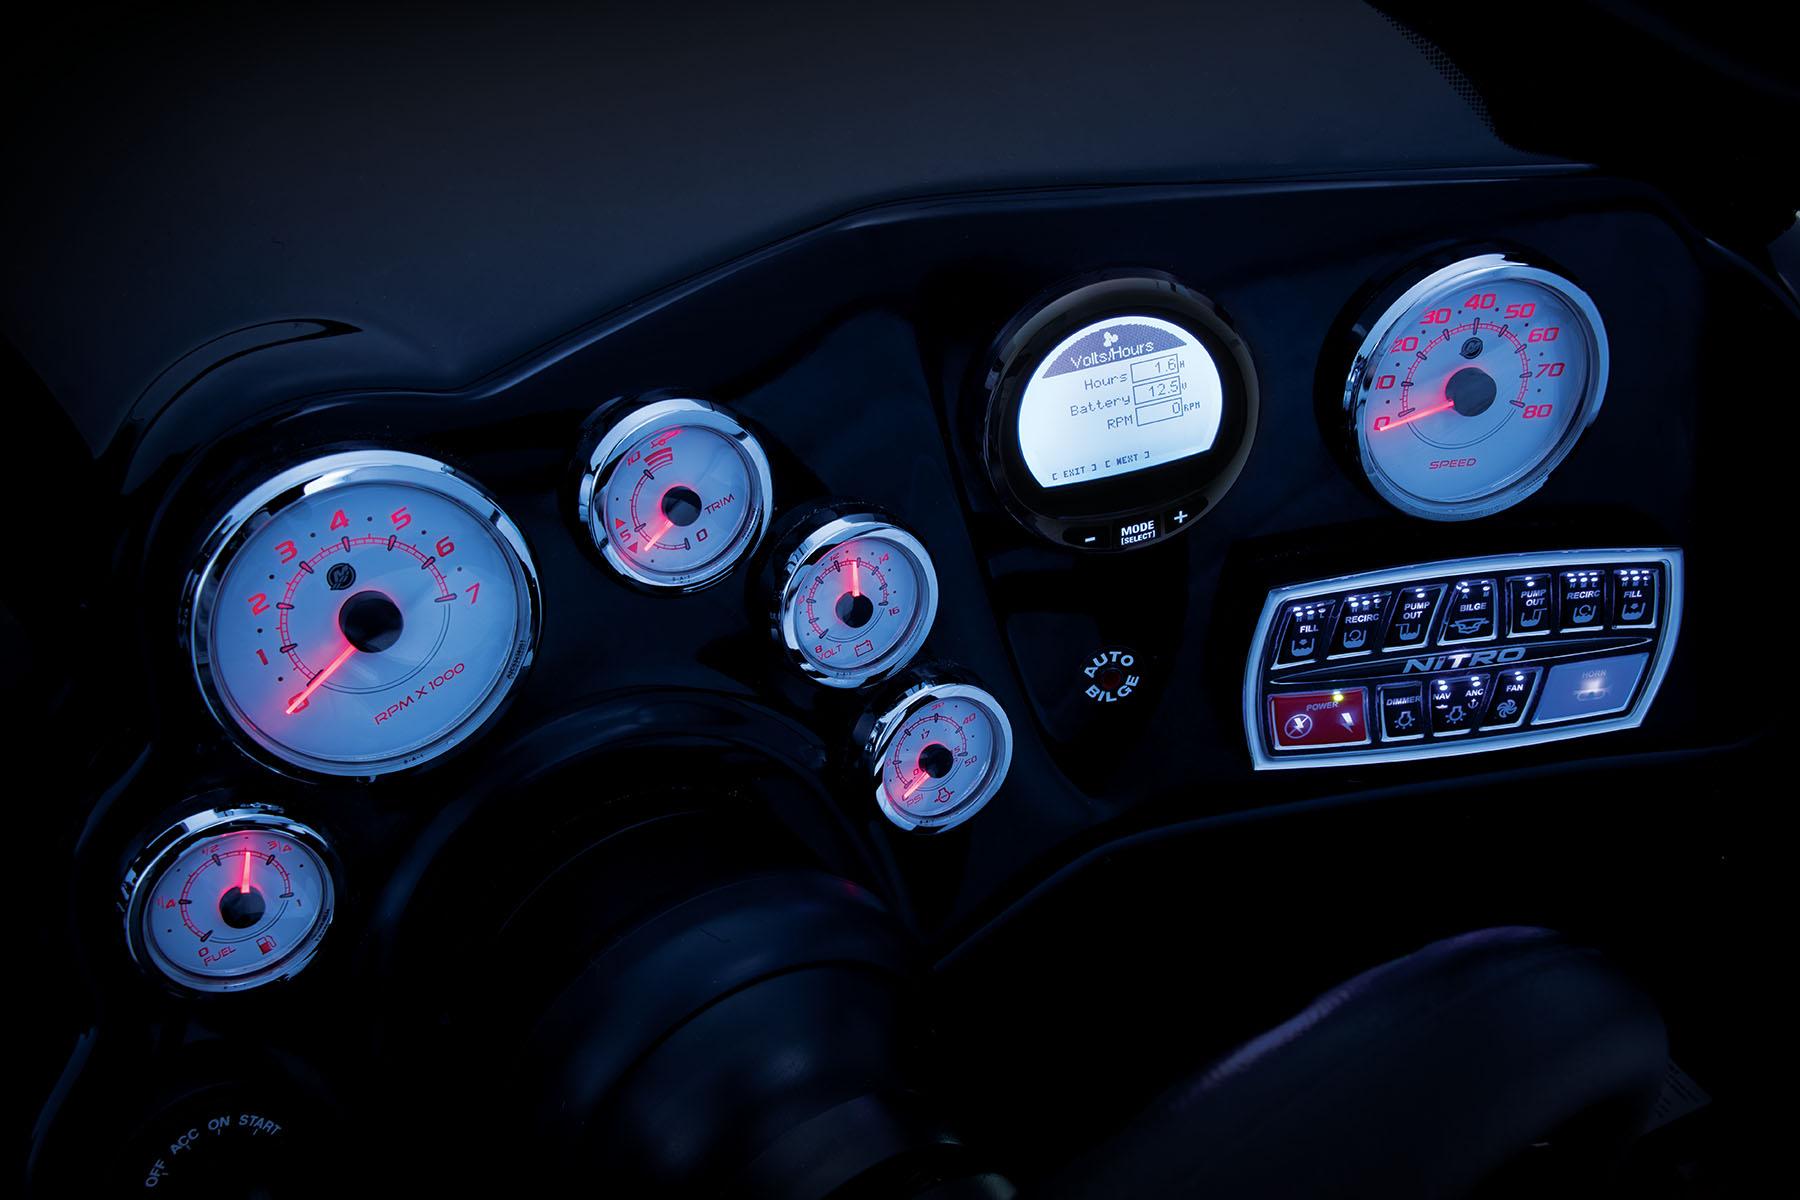 2018 Nitro Zv21 Z Pro High Performance Package Mercury Smartcraft Speedometer Gps Wiring W Verado Motor Electric Hydraulic Tilt Steering Digital Gauges